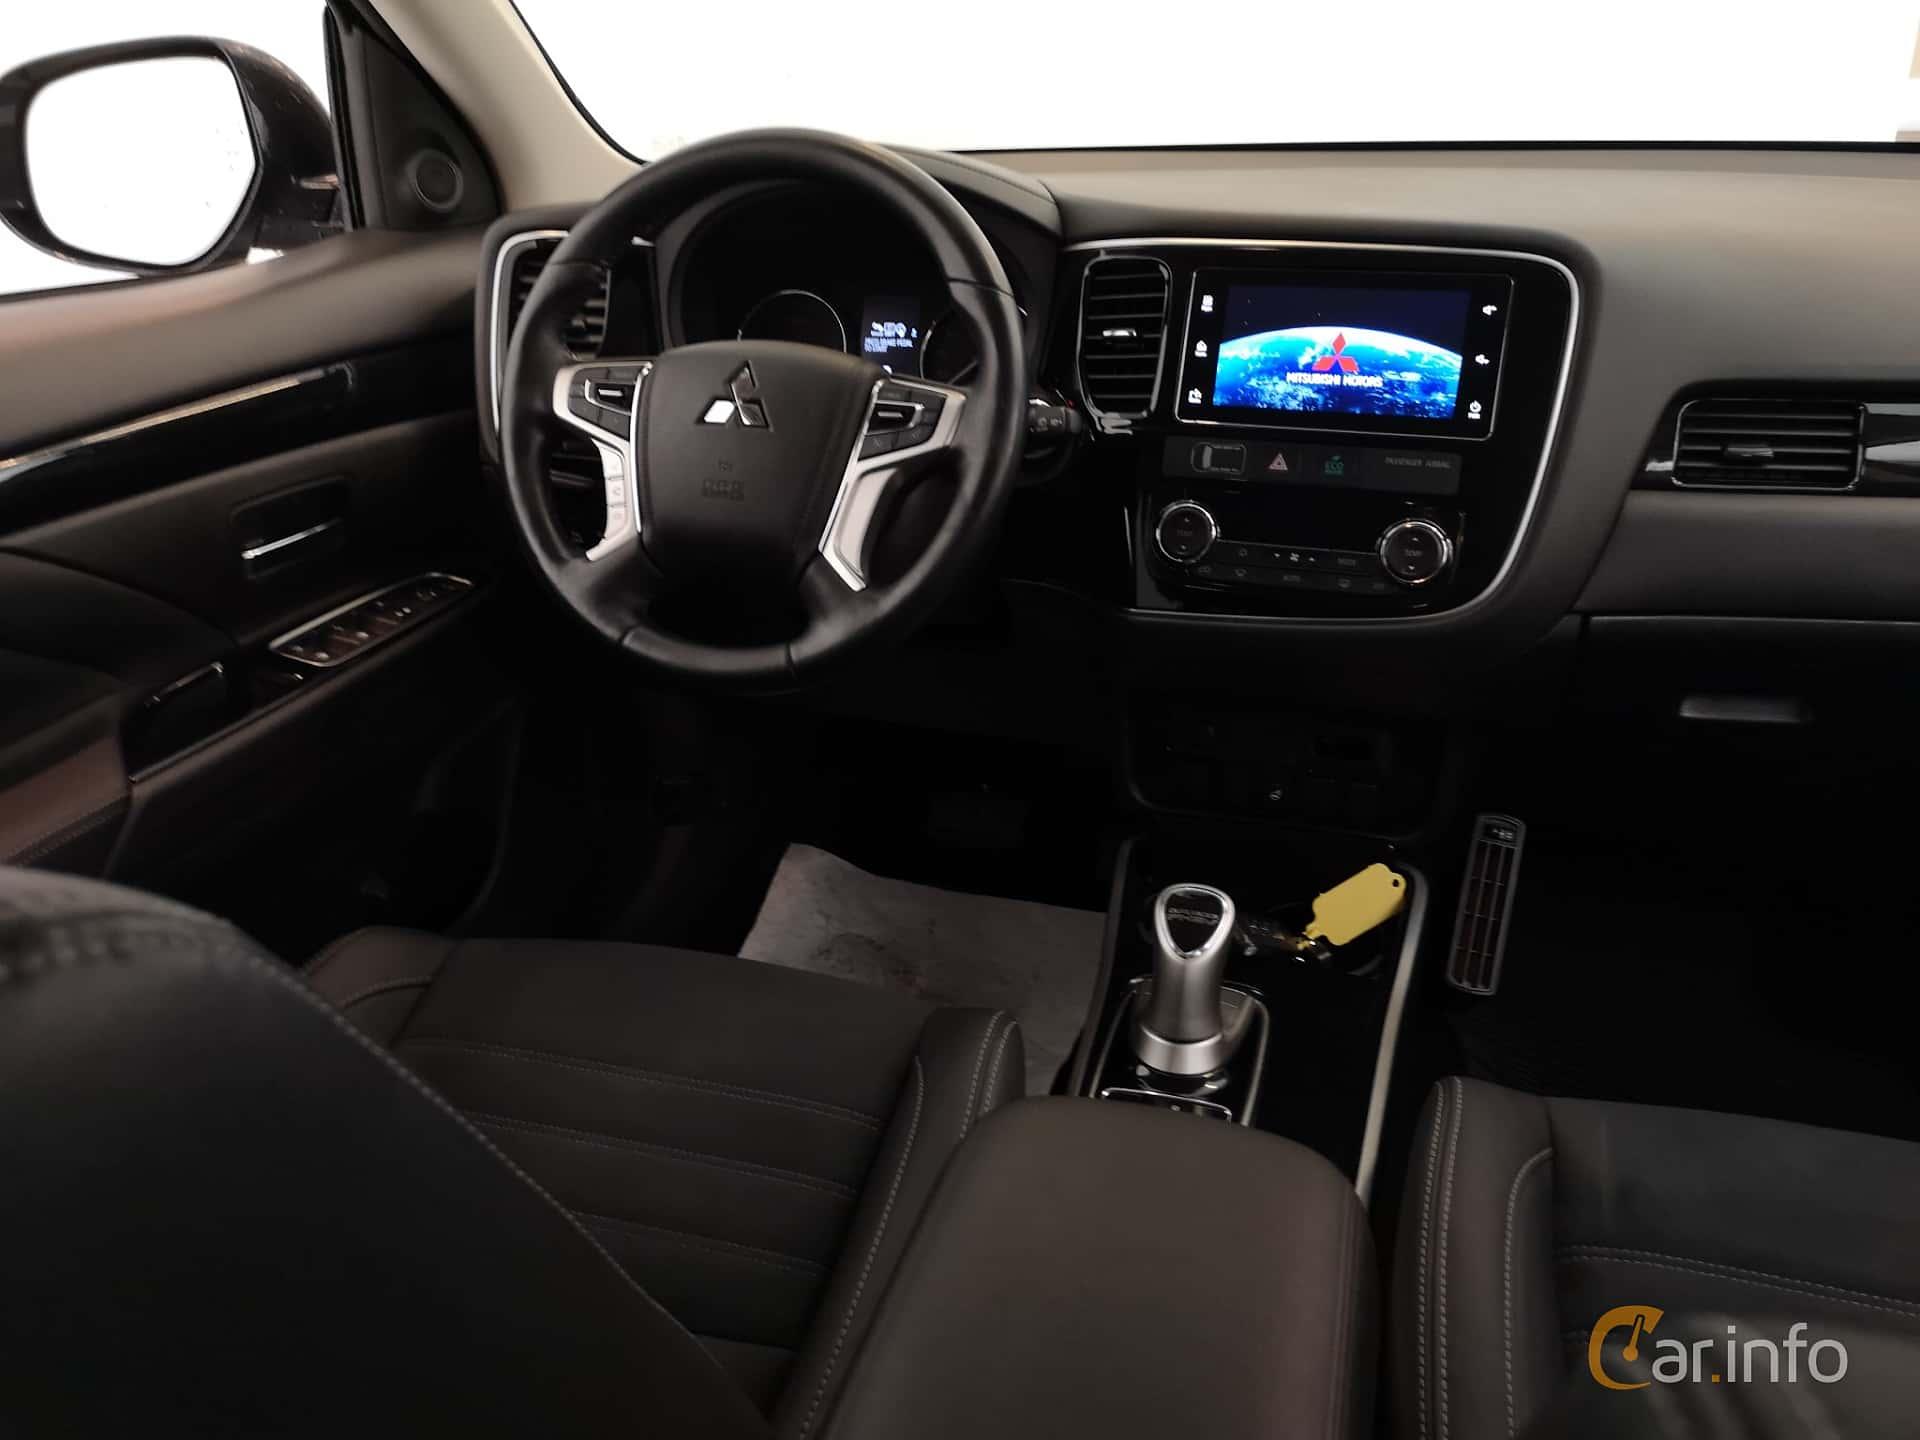 Mitsubishi Outlander P-HEV 2.0 Hybrid 4WD CVT, 203hp, 2017